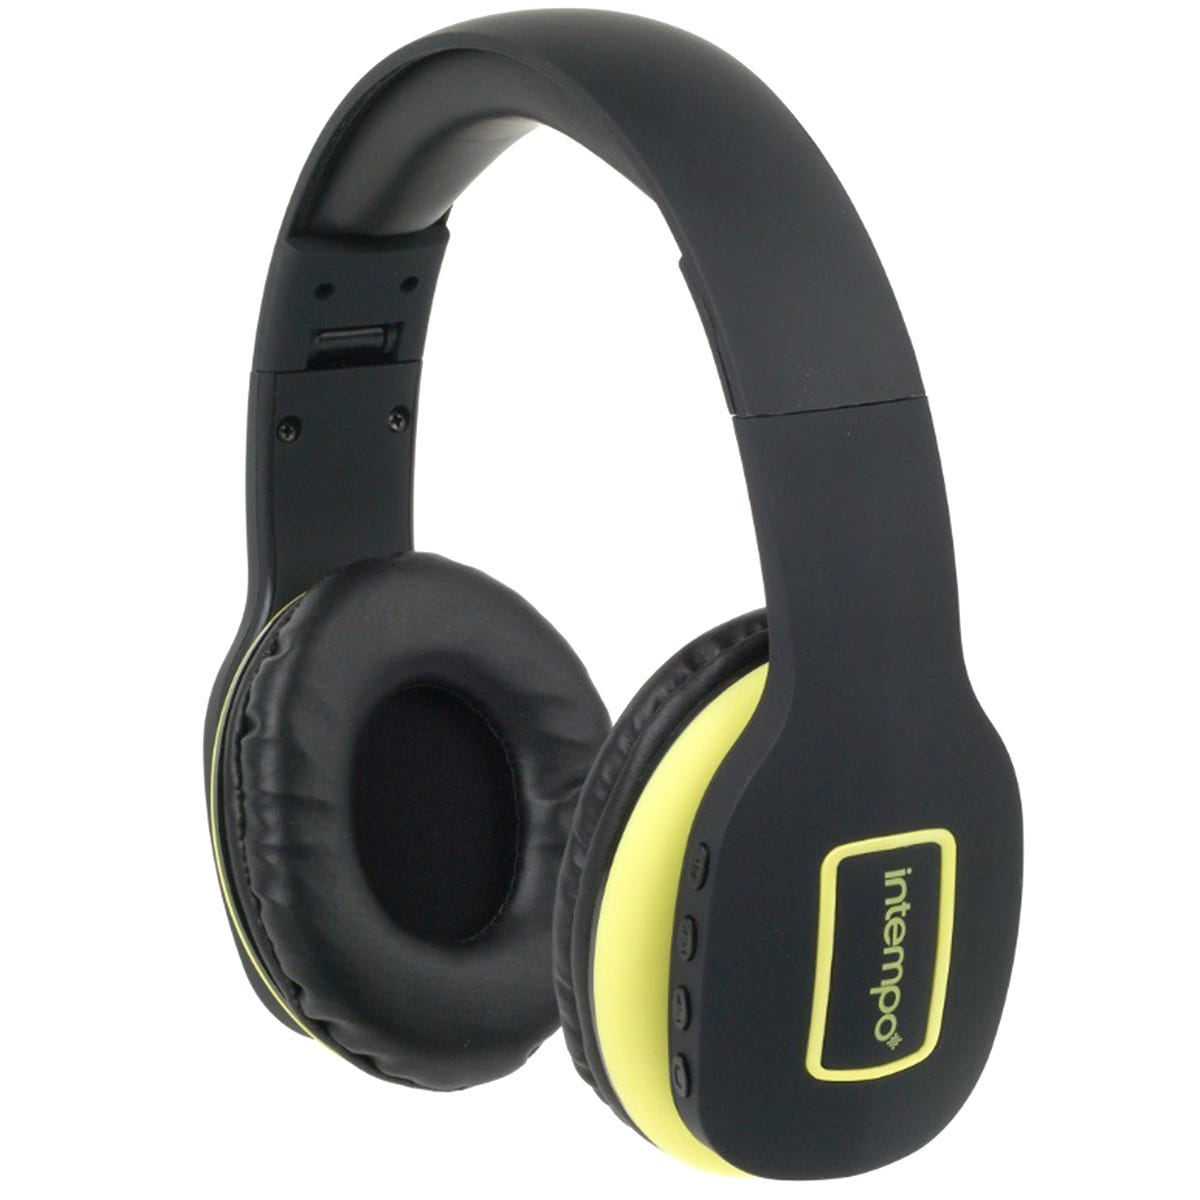 Intempo Active Wireless Bluetooth Foldable Headphones - Black/Yellow